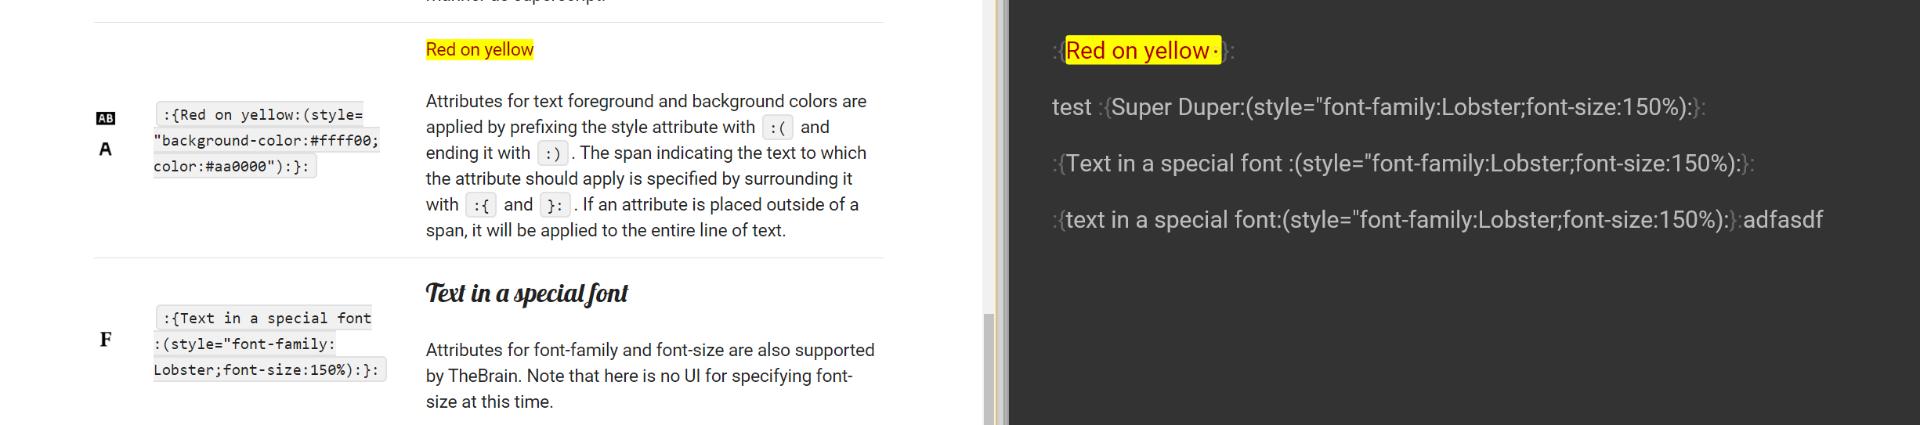 Click image for larger version - Name: Fontish Markdown.png, Views: 25, Size: 195.74 KB